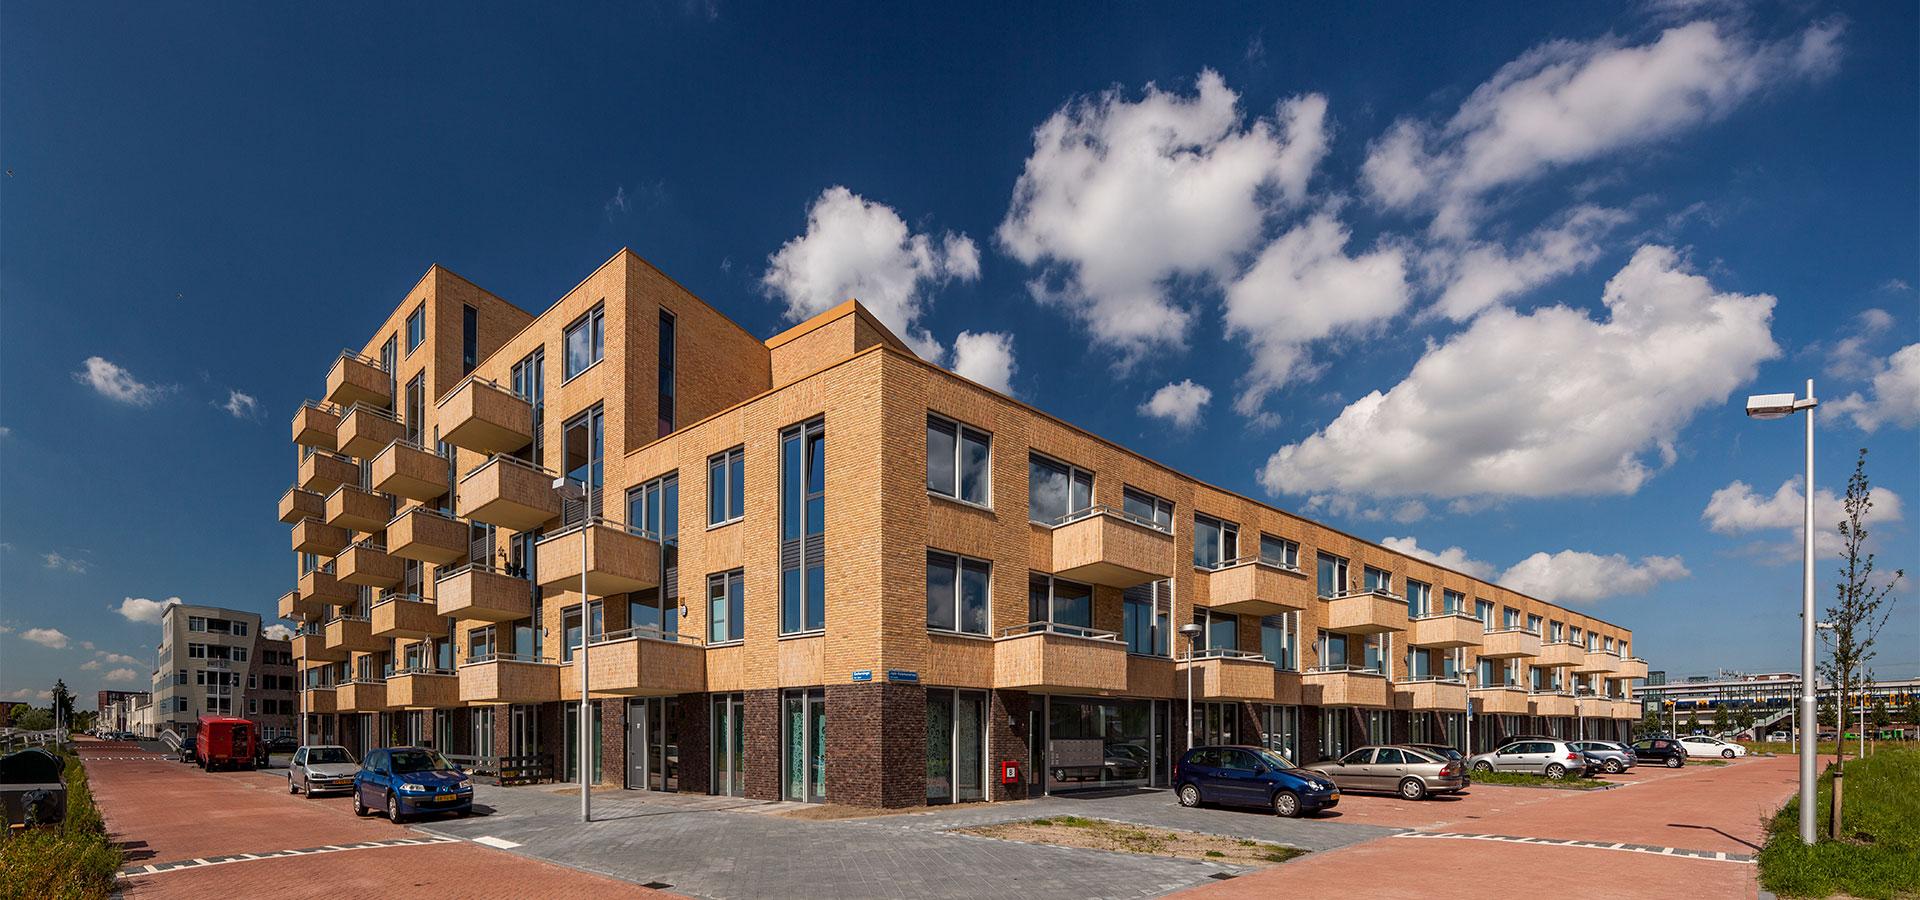 FARO architecten 't Zand Leidsche Rijn Utrecht 08